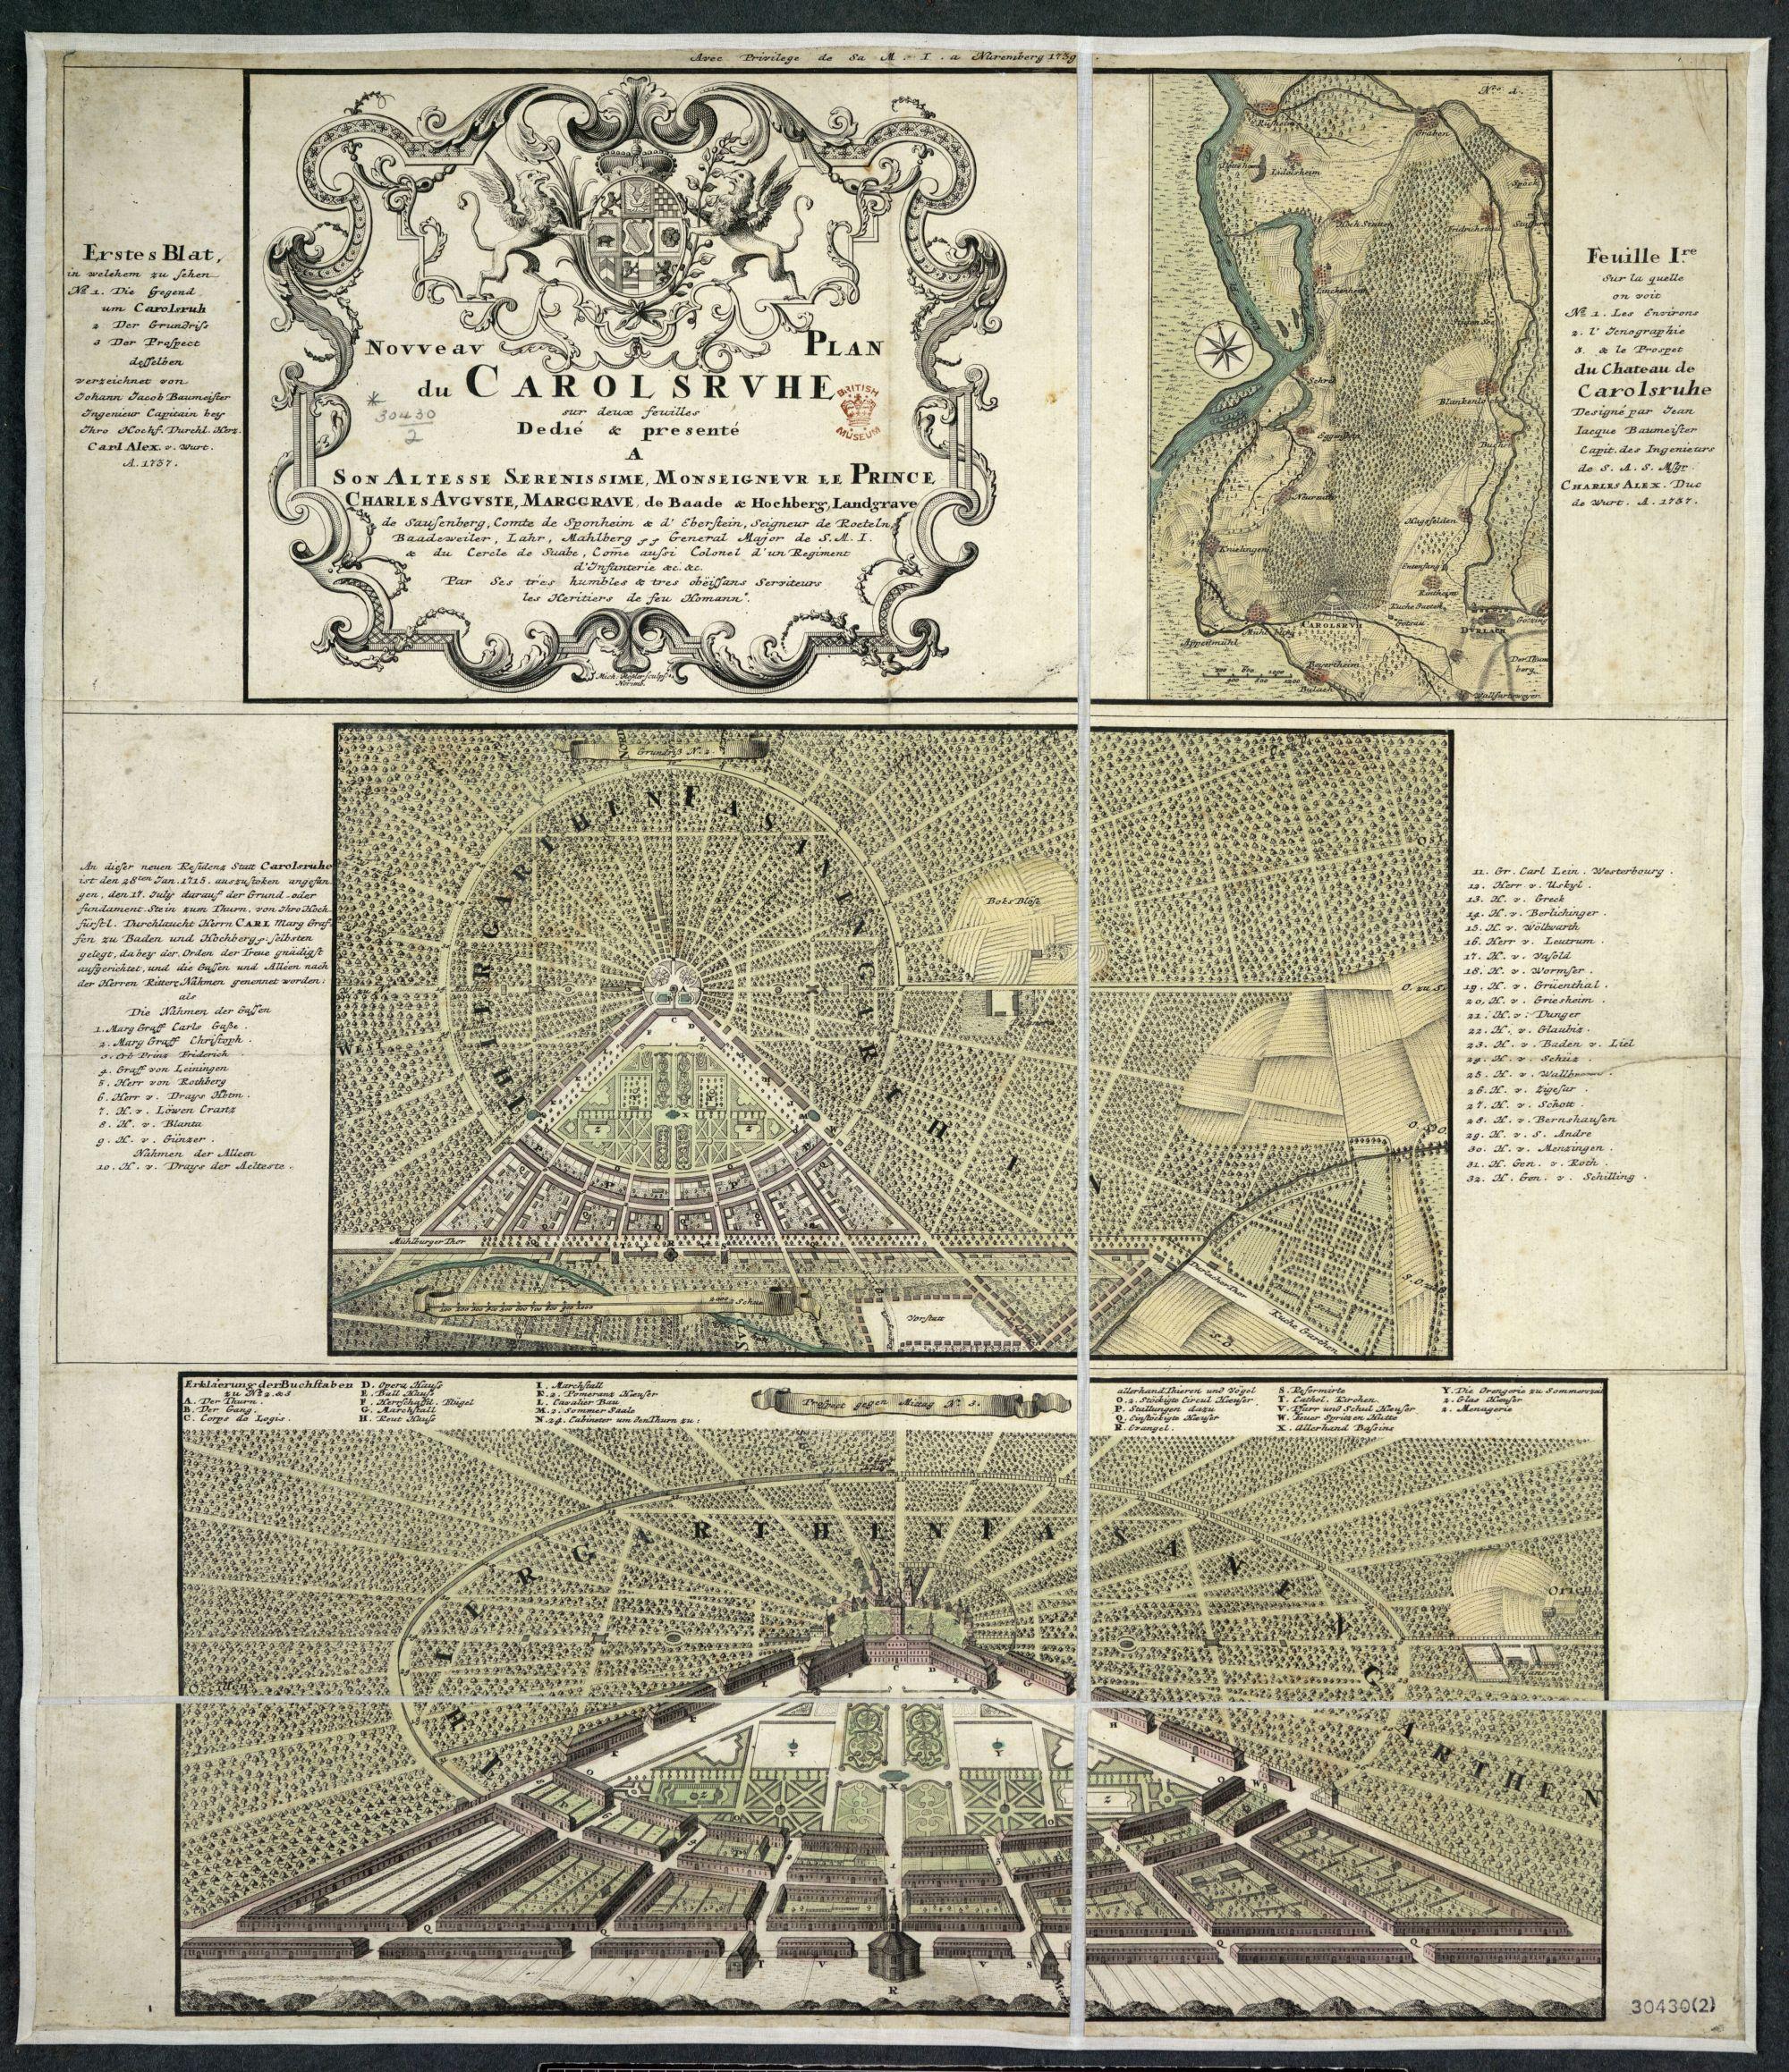 Johann Jacob Baumeister, Nouveau plan du Carolsruhe (Nuremberg: Homann's Heirs, 1737). Maps 30430.(2).